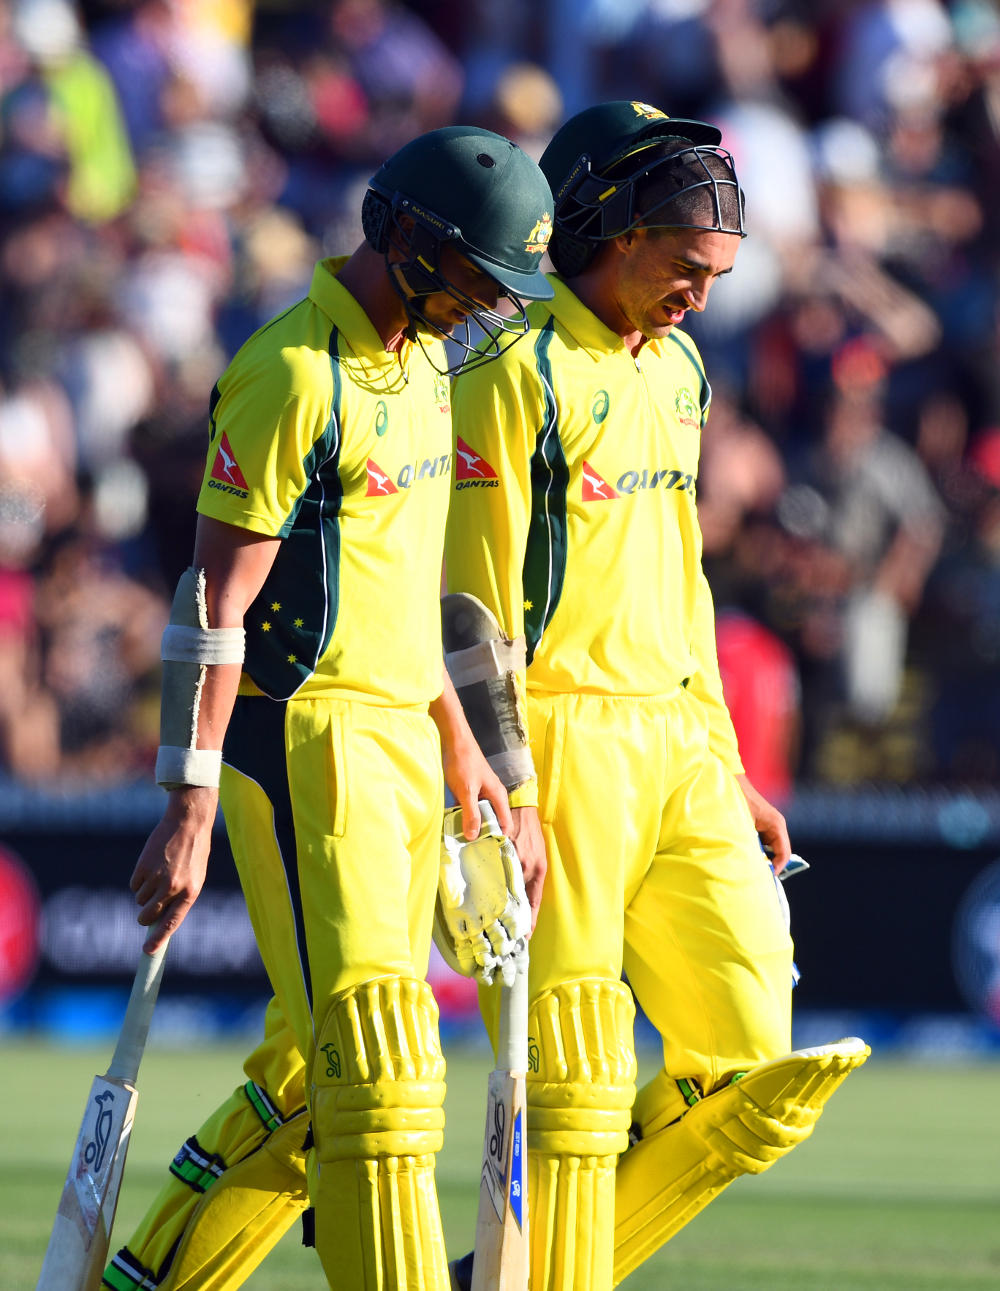 josh-hazelwood-mitchell-starc-cricket-australia-2017-tall